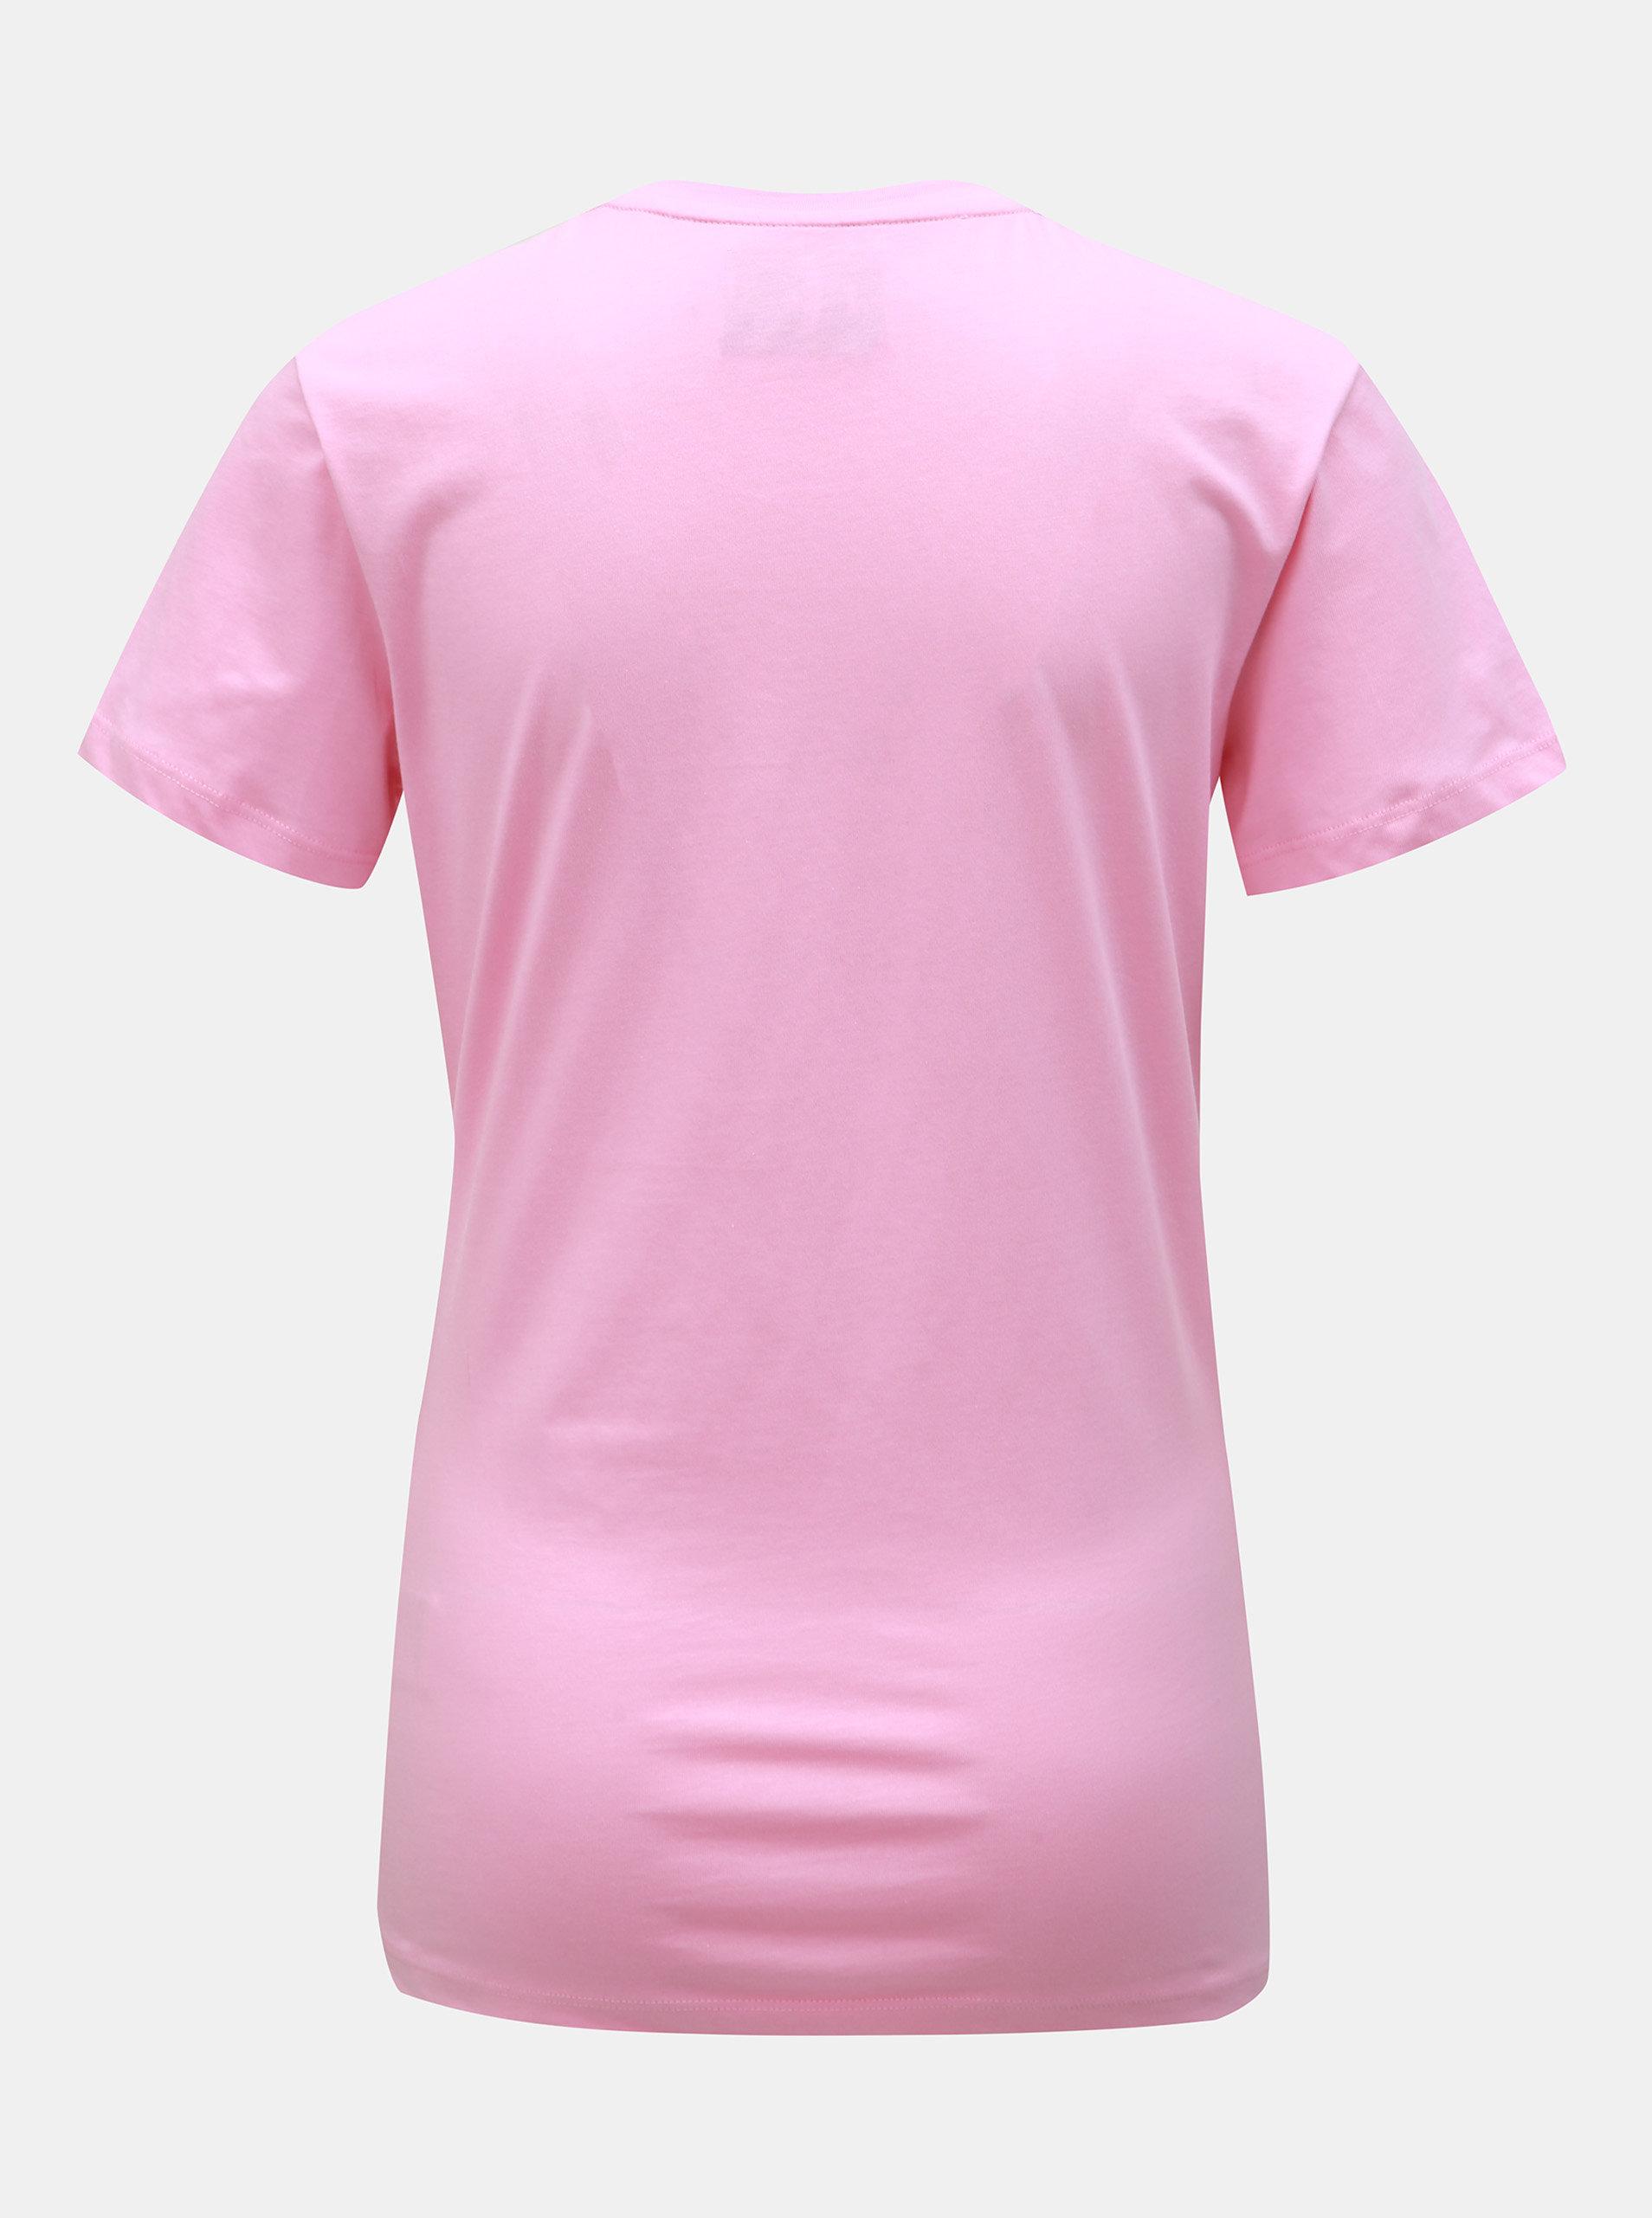 e9c0d441c2c1 Růžové dámské tričko s potiskem Calvin Klein Jeans ...